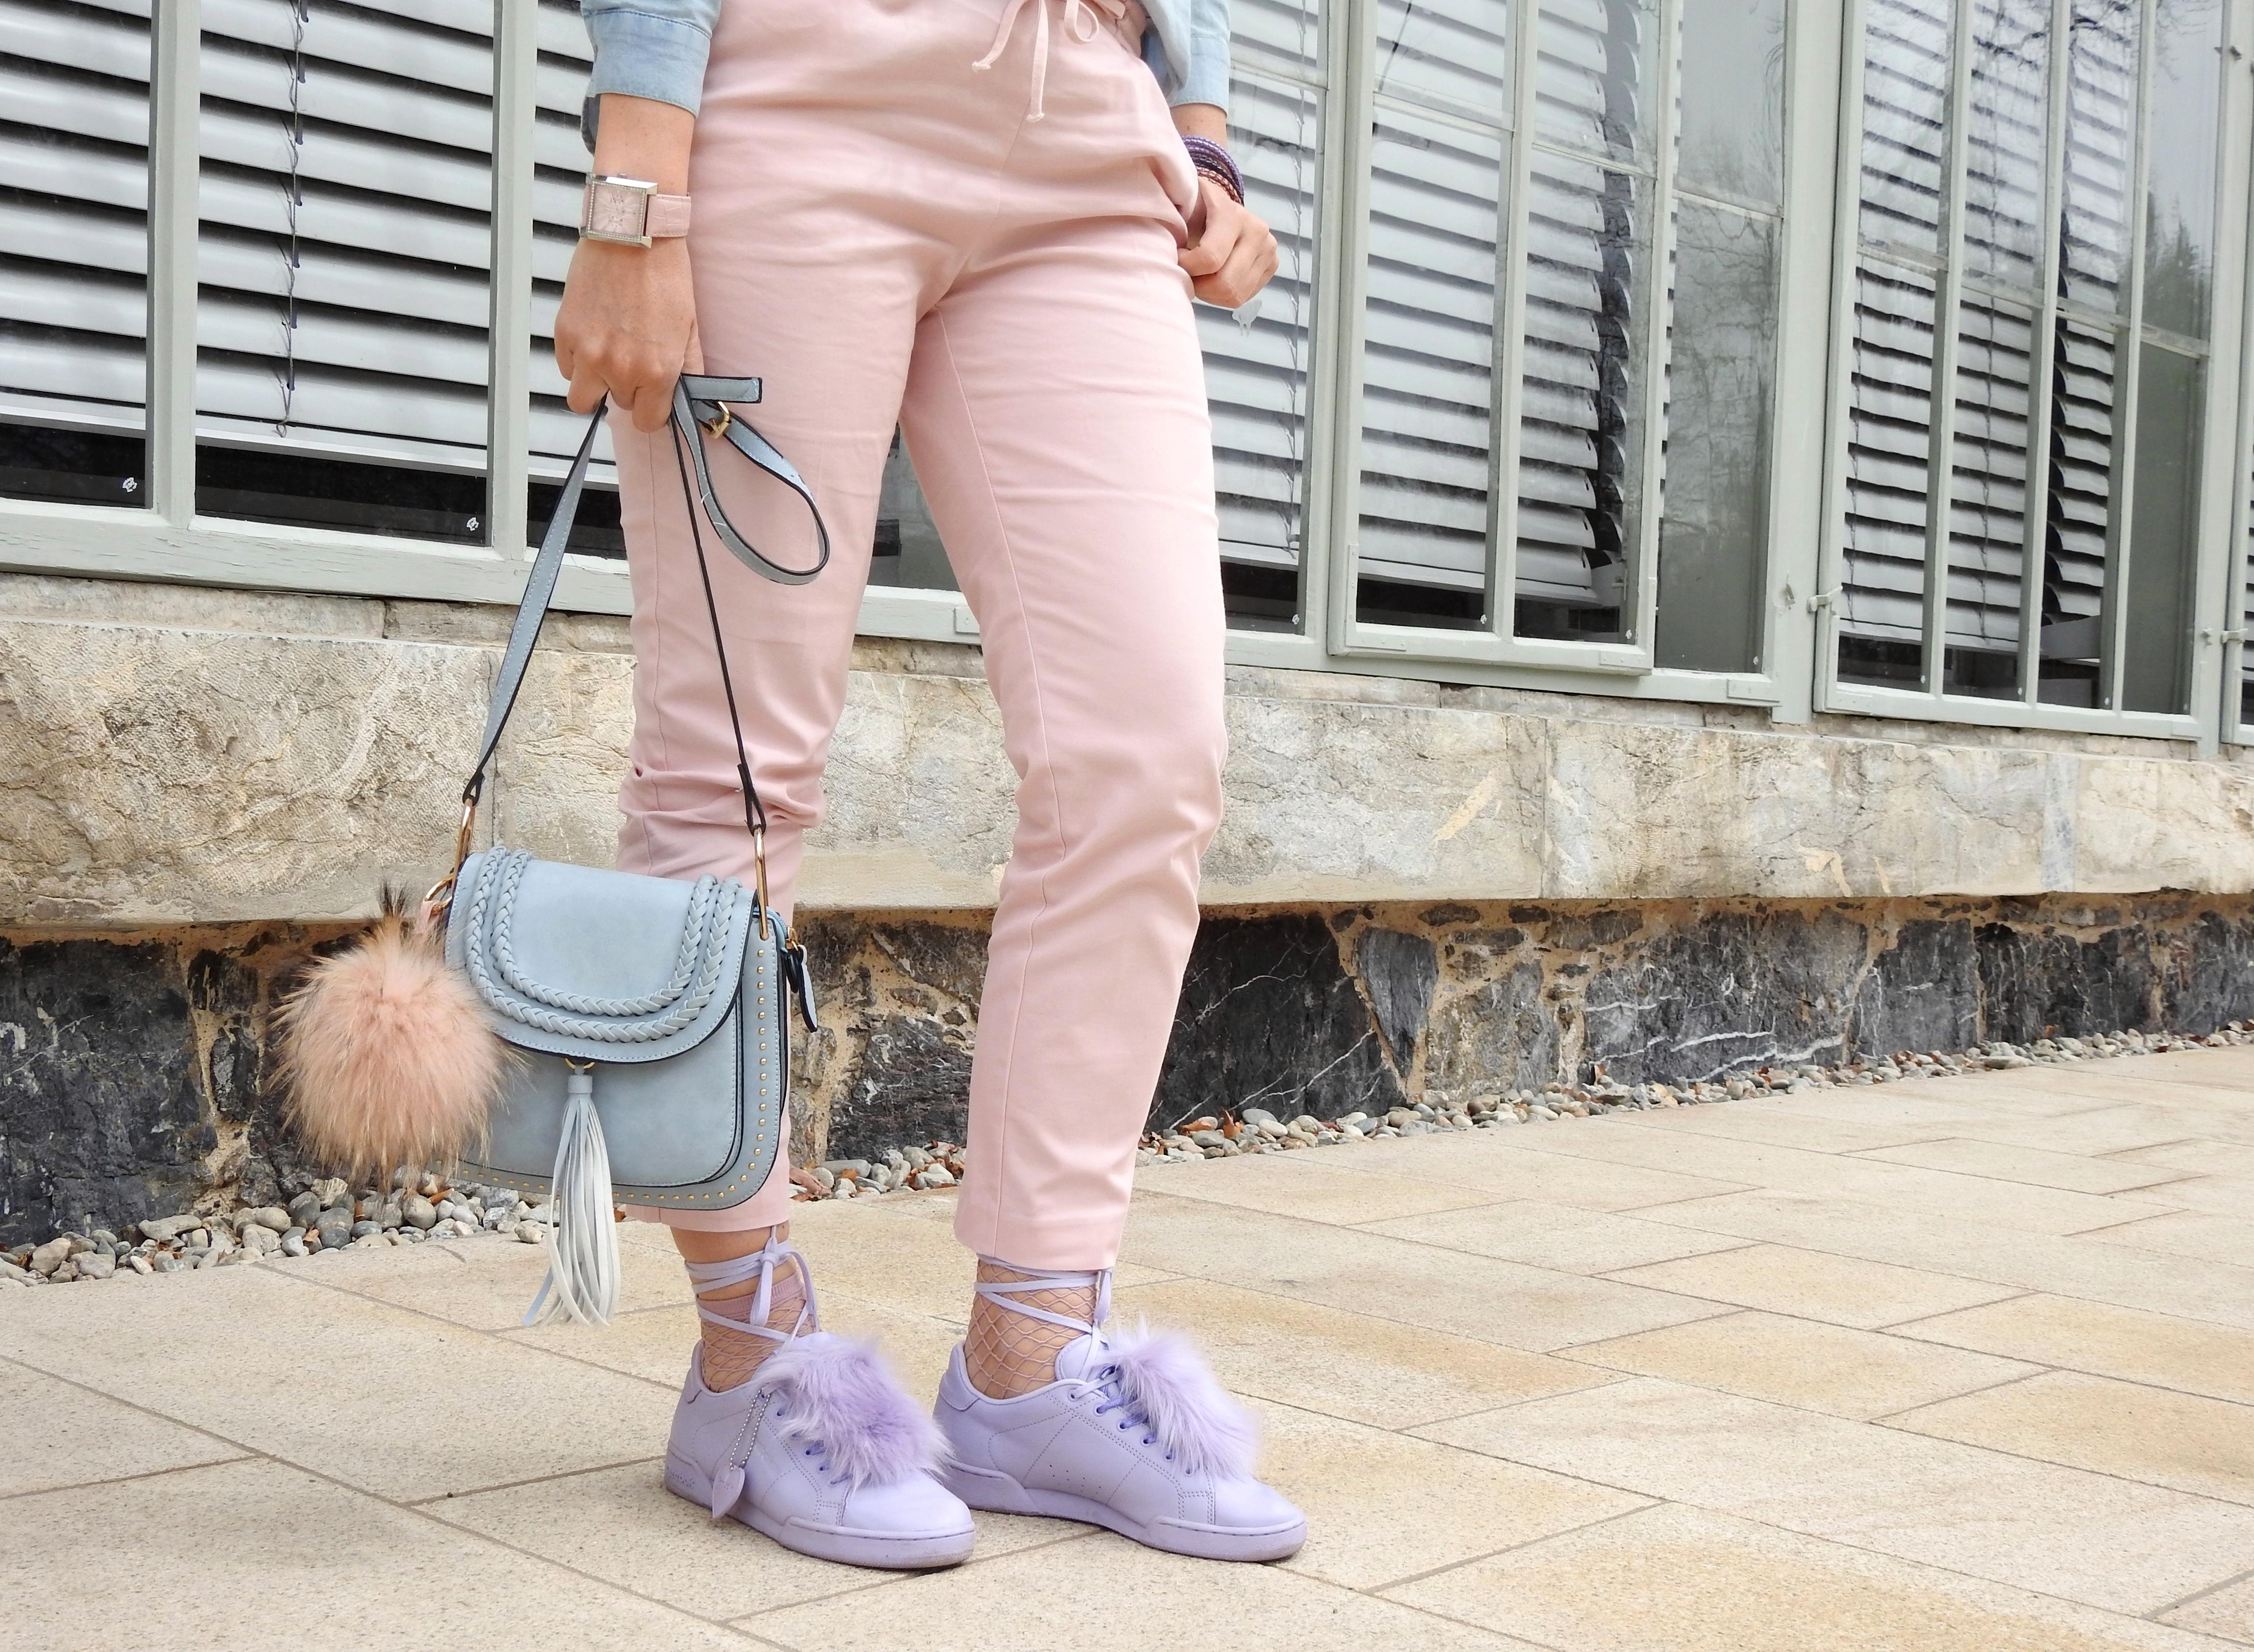 Pastellfarben-Colours-Springvibes-Frühlingsfarben-Frühling-Lila-Fishnet-STockings-Chloe-Bag-pink-Pants-carrieslifestyle-Tamara-Prutsch